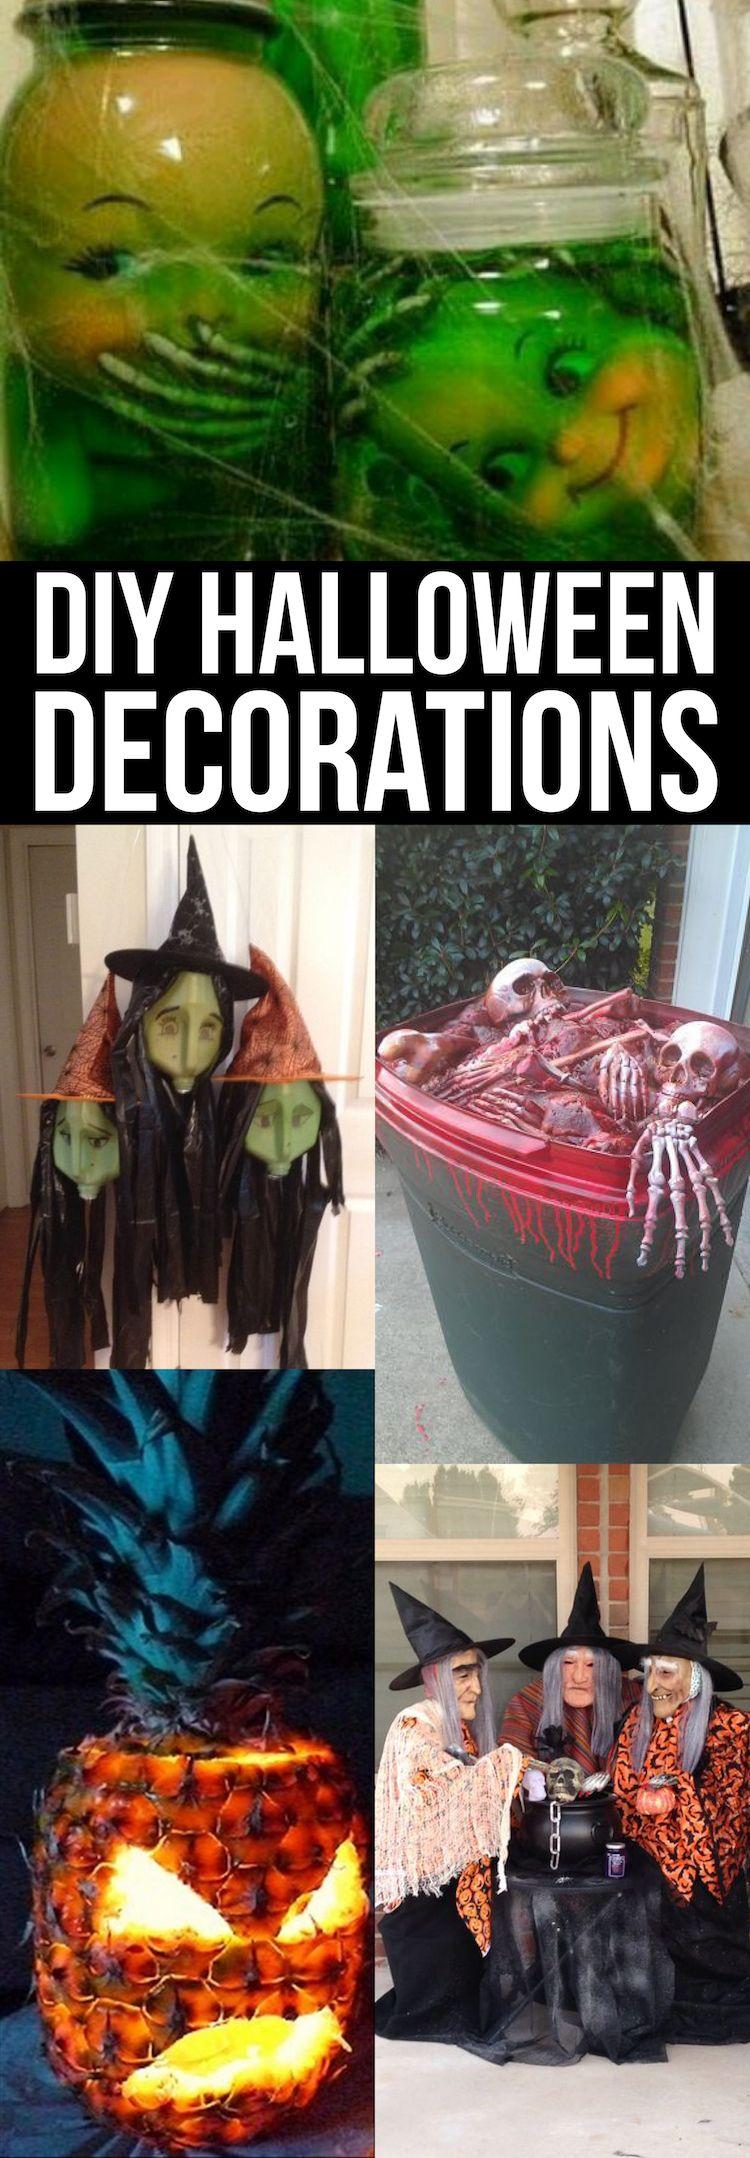 Diy halloween decor pinterest - The Best Diy Halloween Decorations